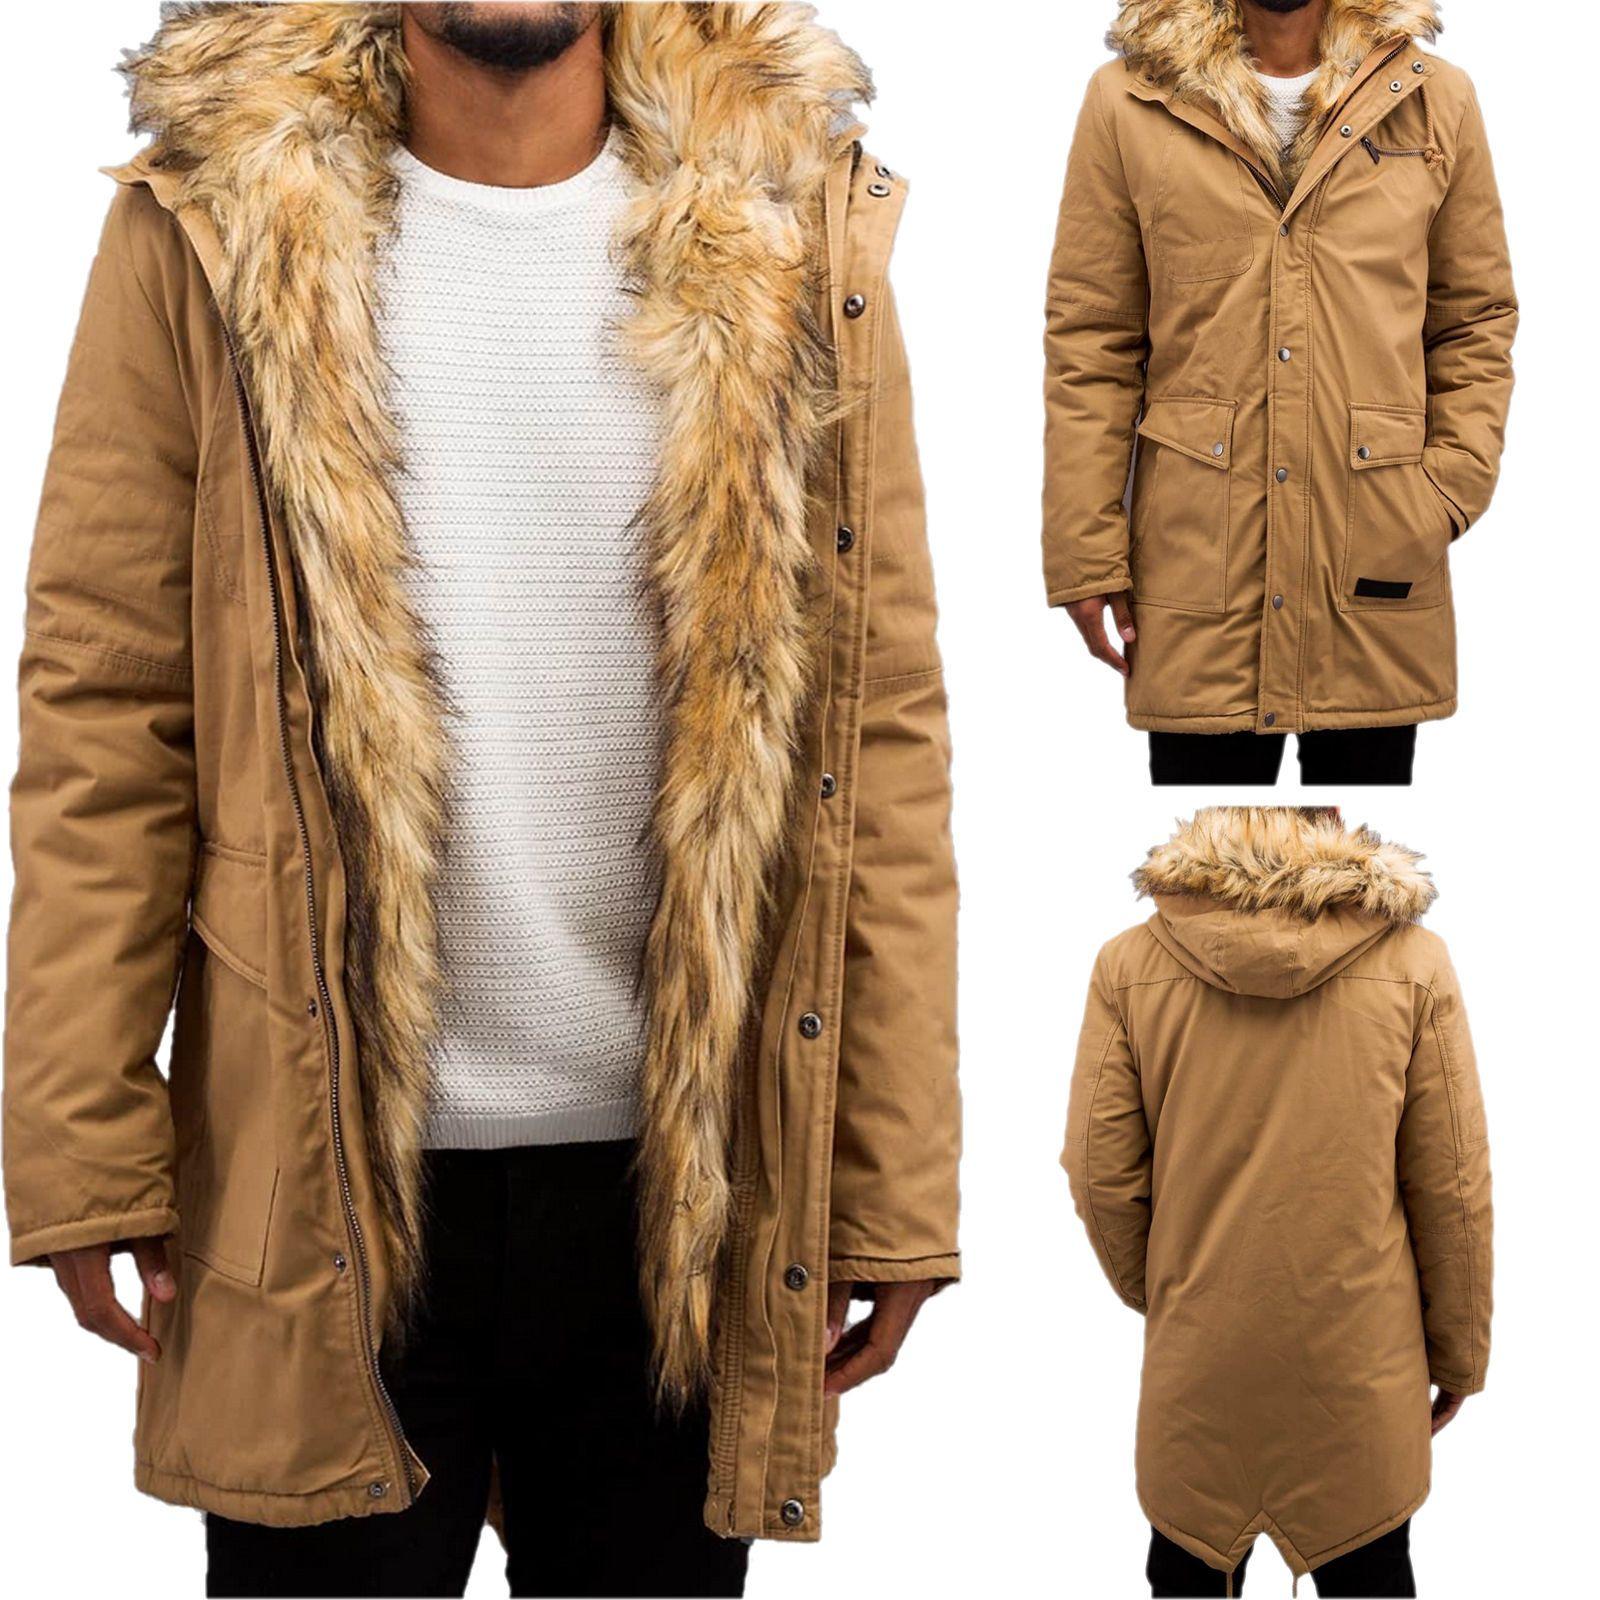 Bangastic Herren Parka Mantel Jacke mit Kunst Pelz 012br in Kleidung    Accessoires, Herrenmode, Jacken   Mäntel   eBay 2ce279a6a2